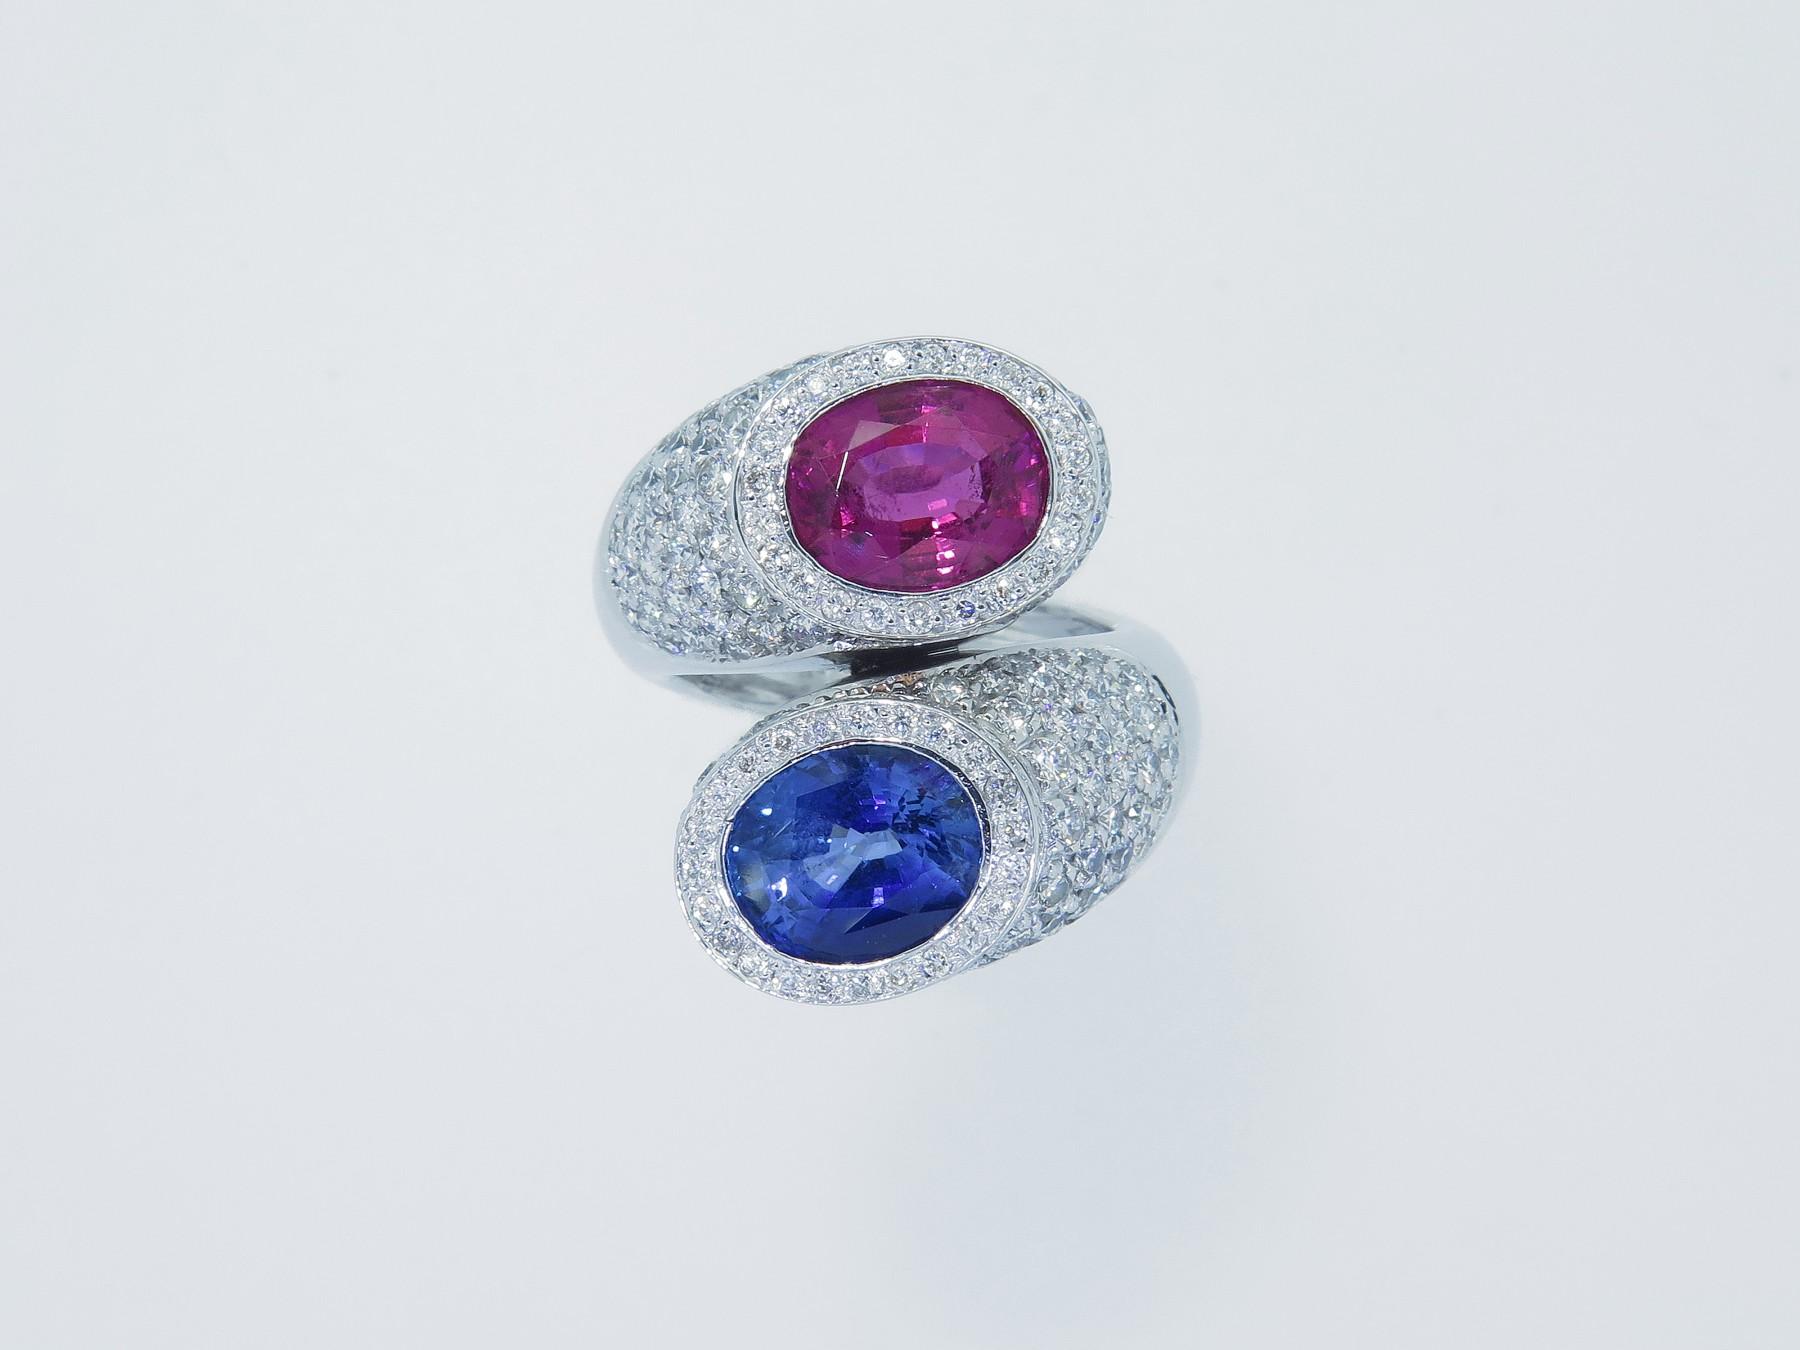 diamanti, tormalina rubellite e zaffiro di Ceylon